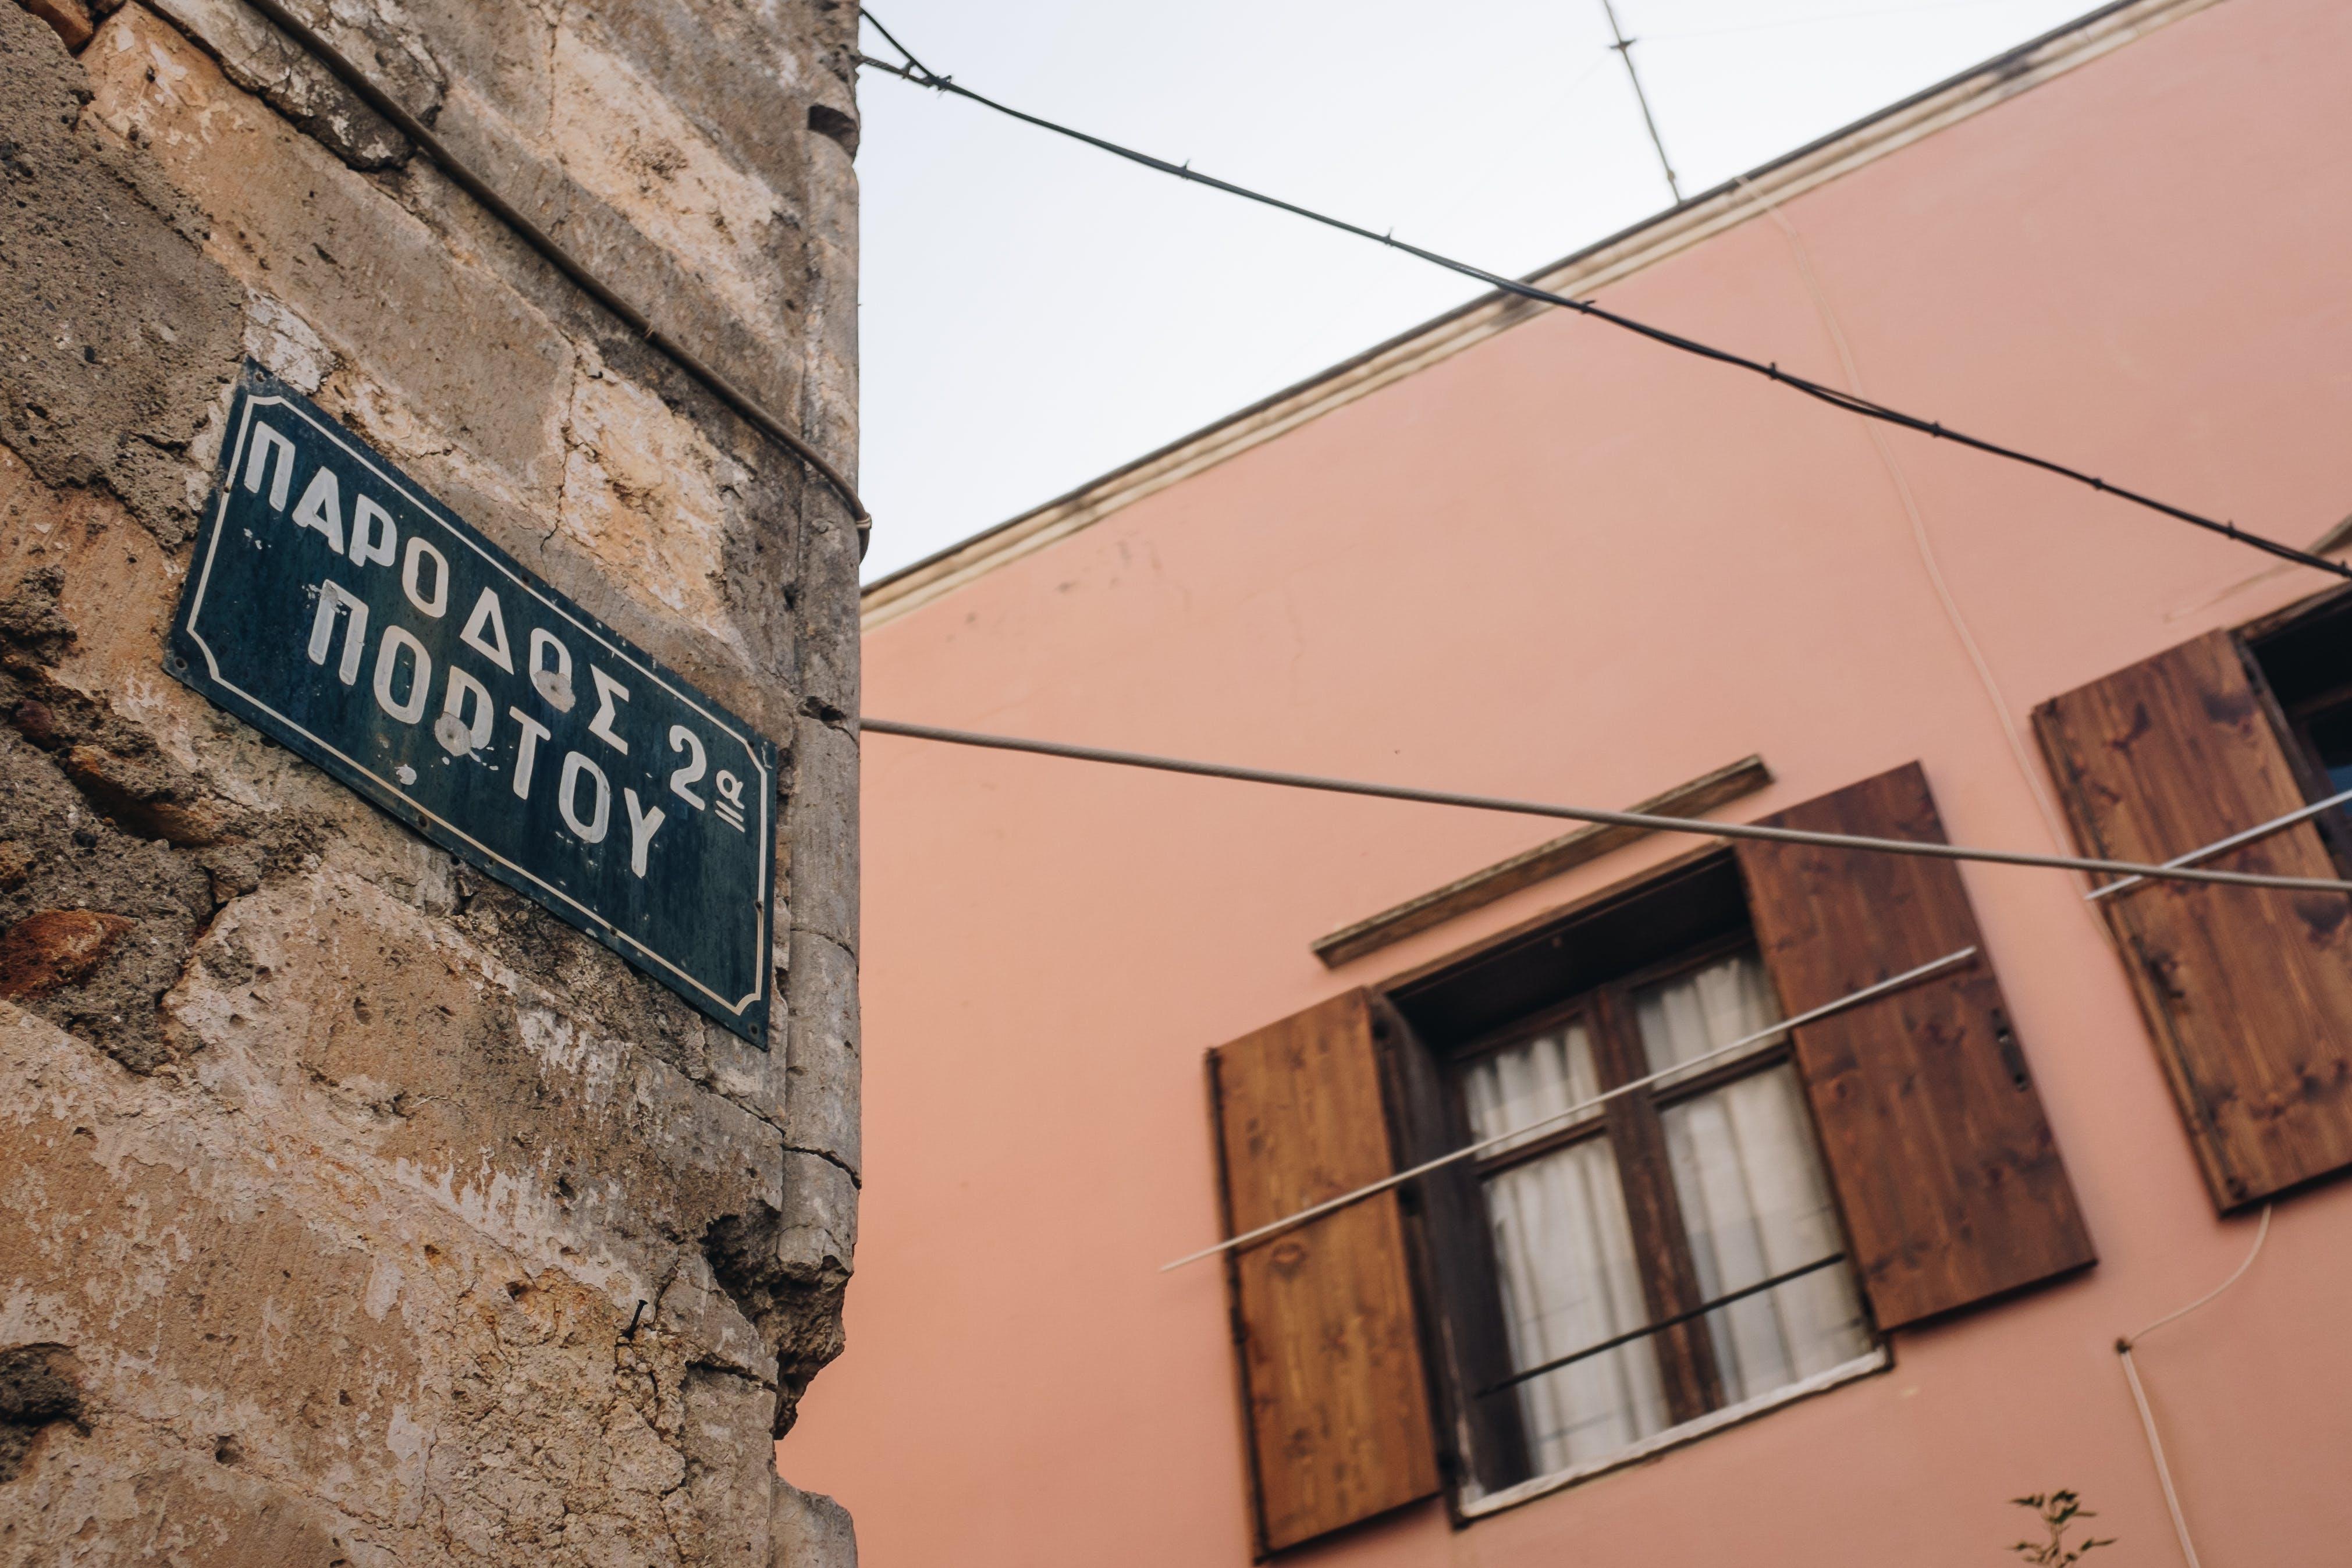 Fotos de stock gratuitas de abandonado, arquitectura, calamidad, calle